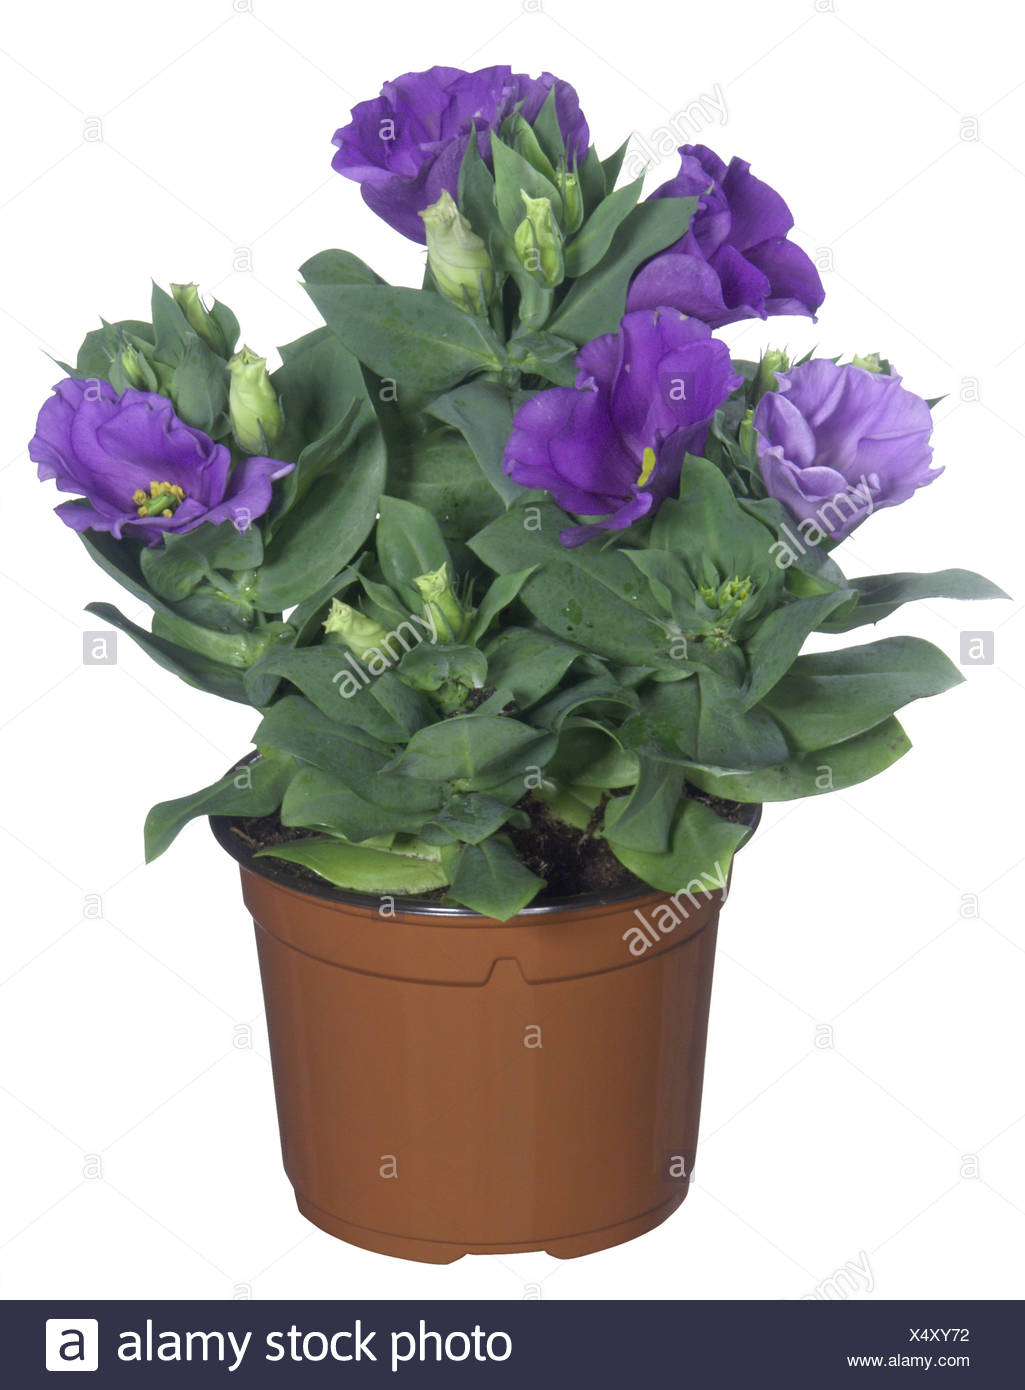 Lisianthus, Tulip Gentian, Texas Bluebell (Eustoma grandiflorum), potted plant - Stock Image